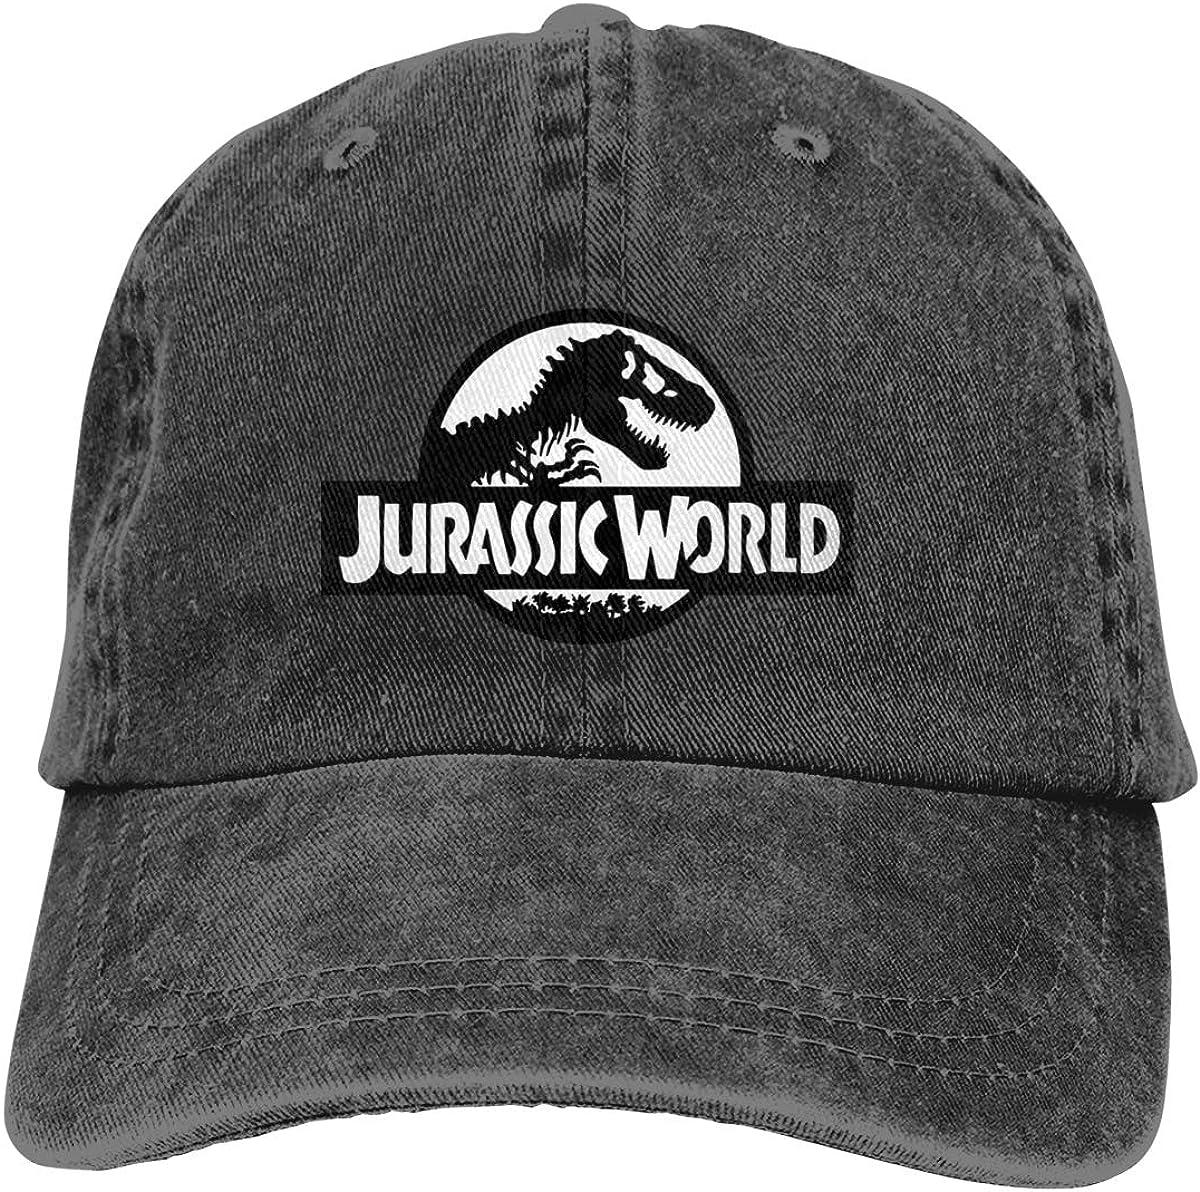 LeoBird Jur_Assic World Logo Unisex 100% Cotton Cowboy Caps Adjustable Unstructured Caps Suncreen Baseball Hats